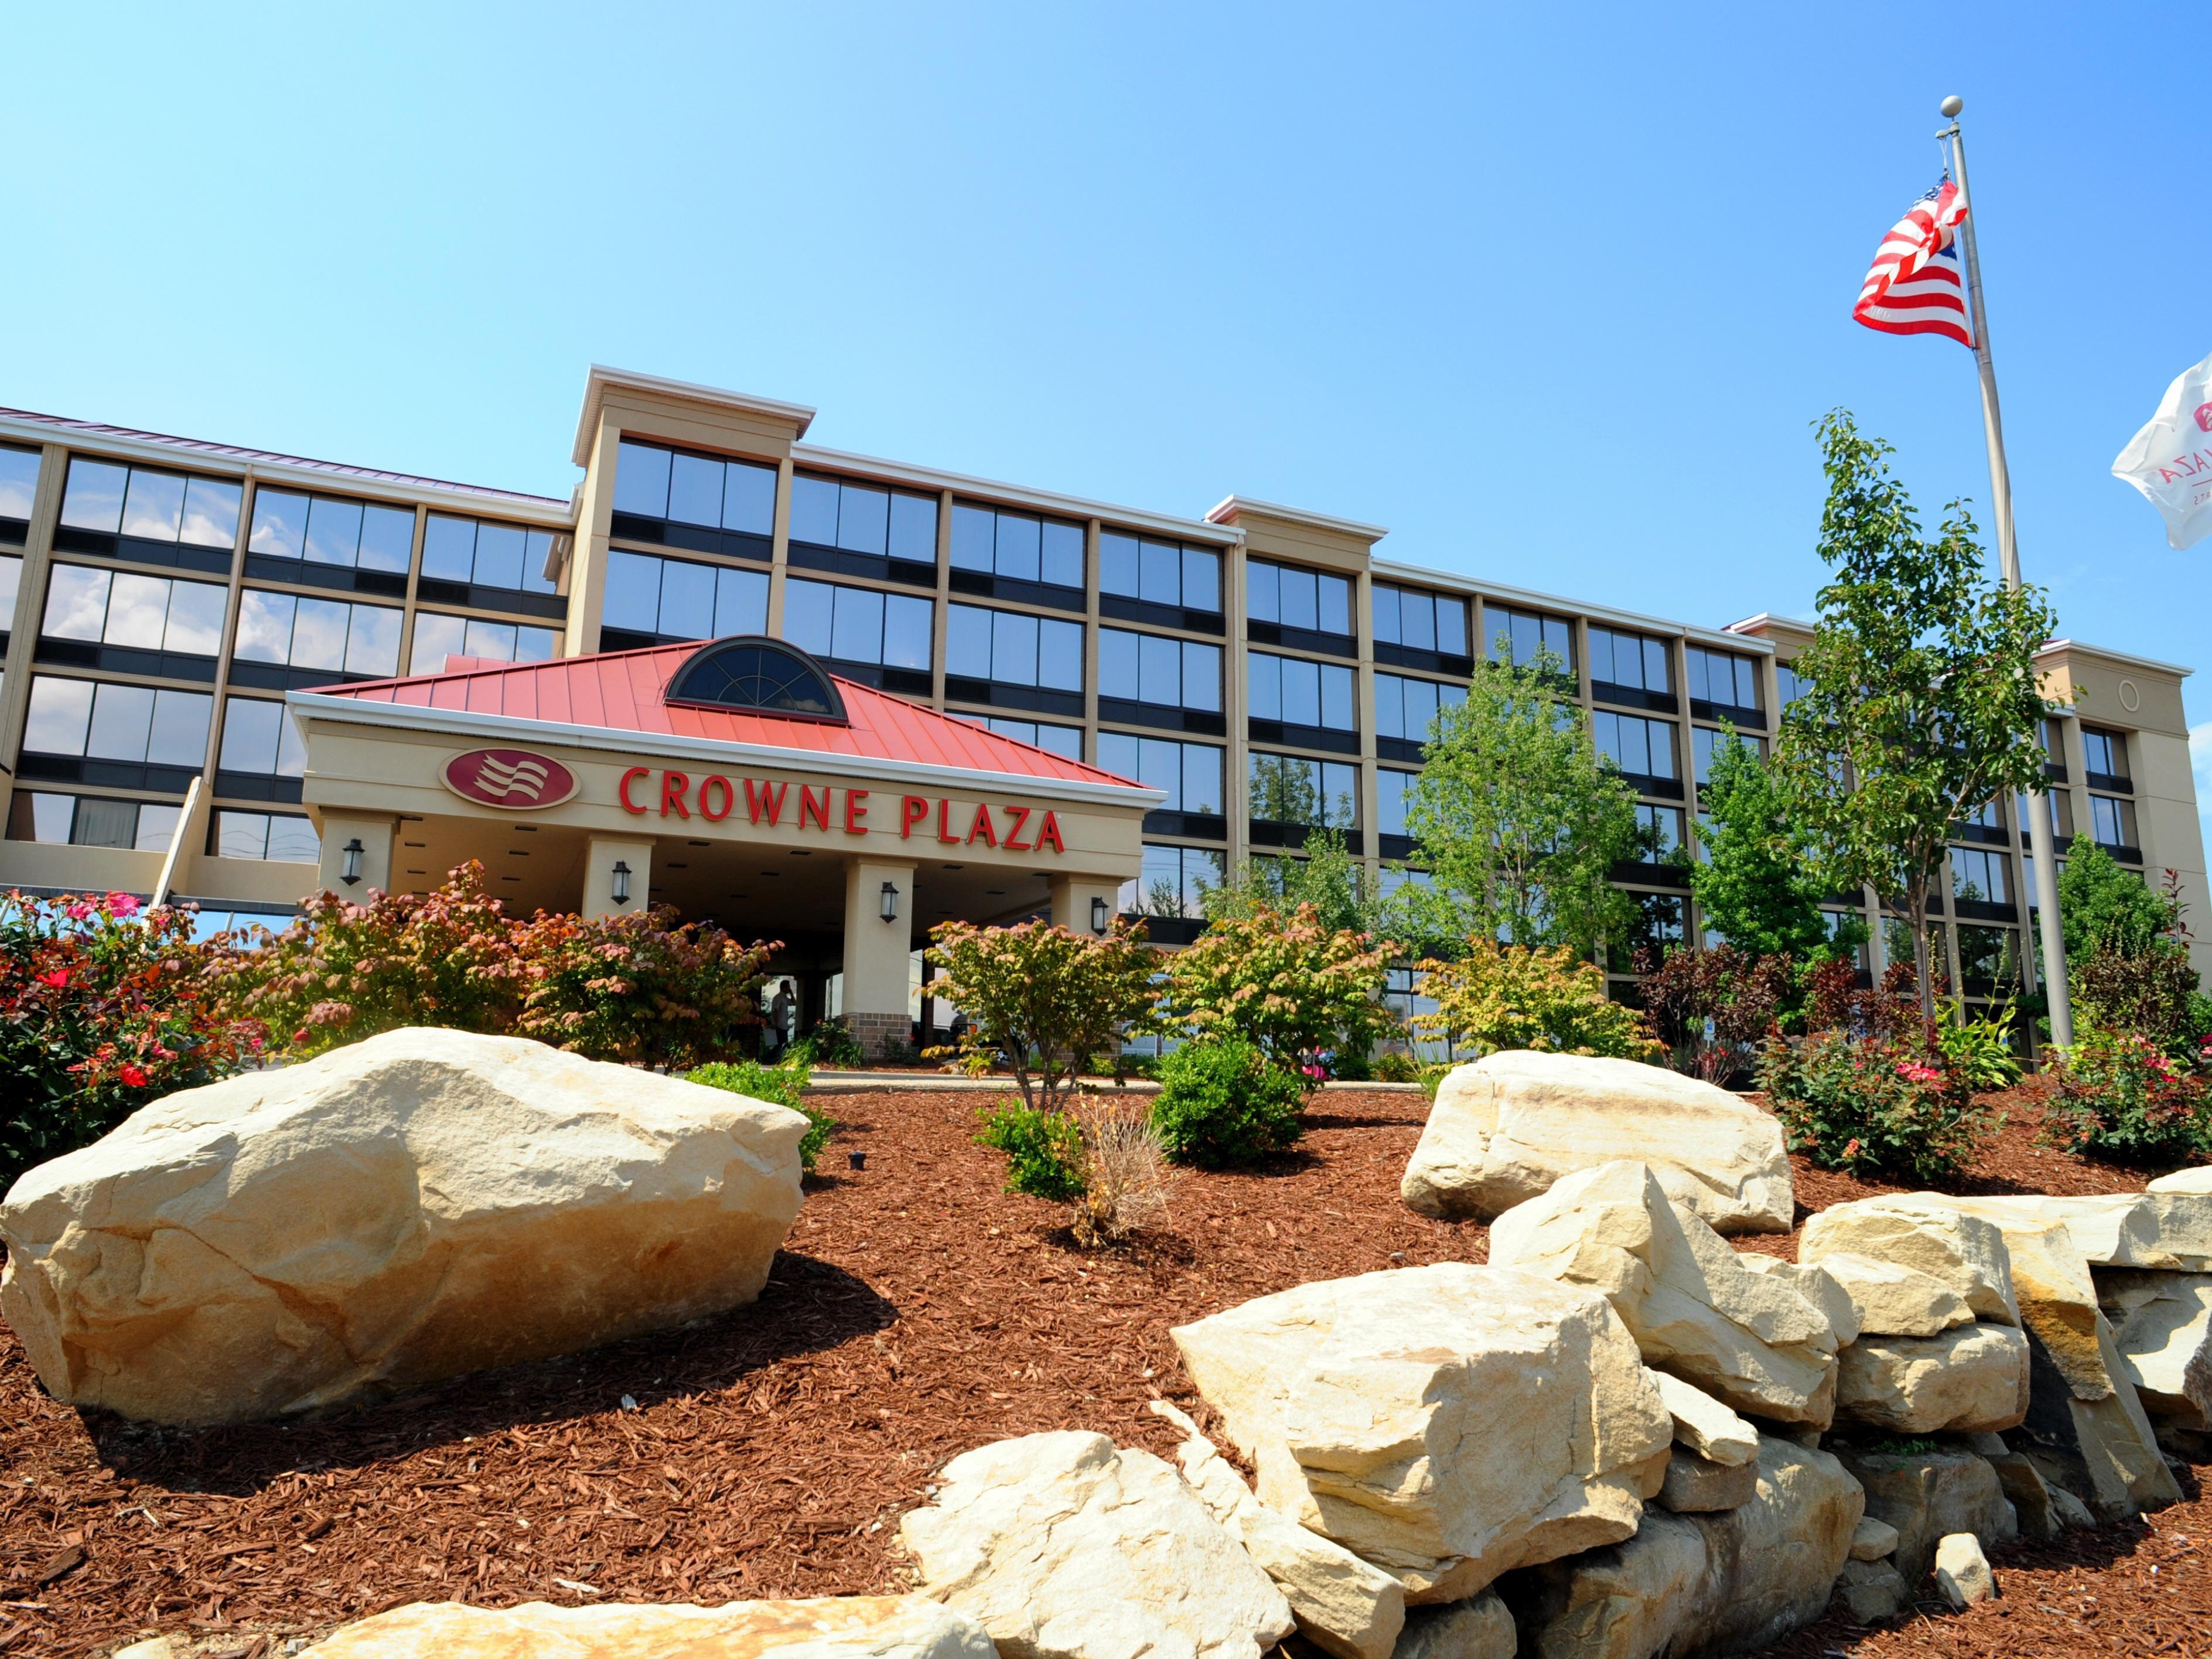 Pool middleburg heights ohio hotels